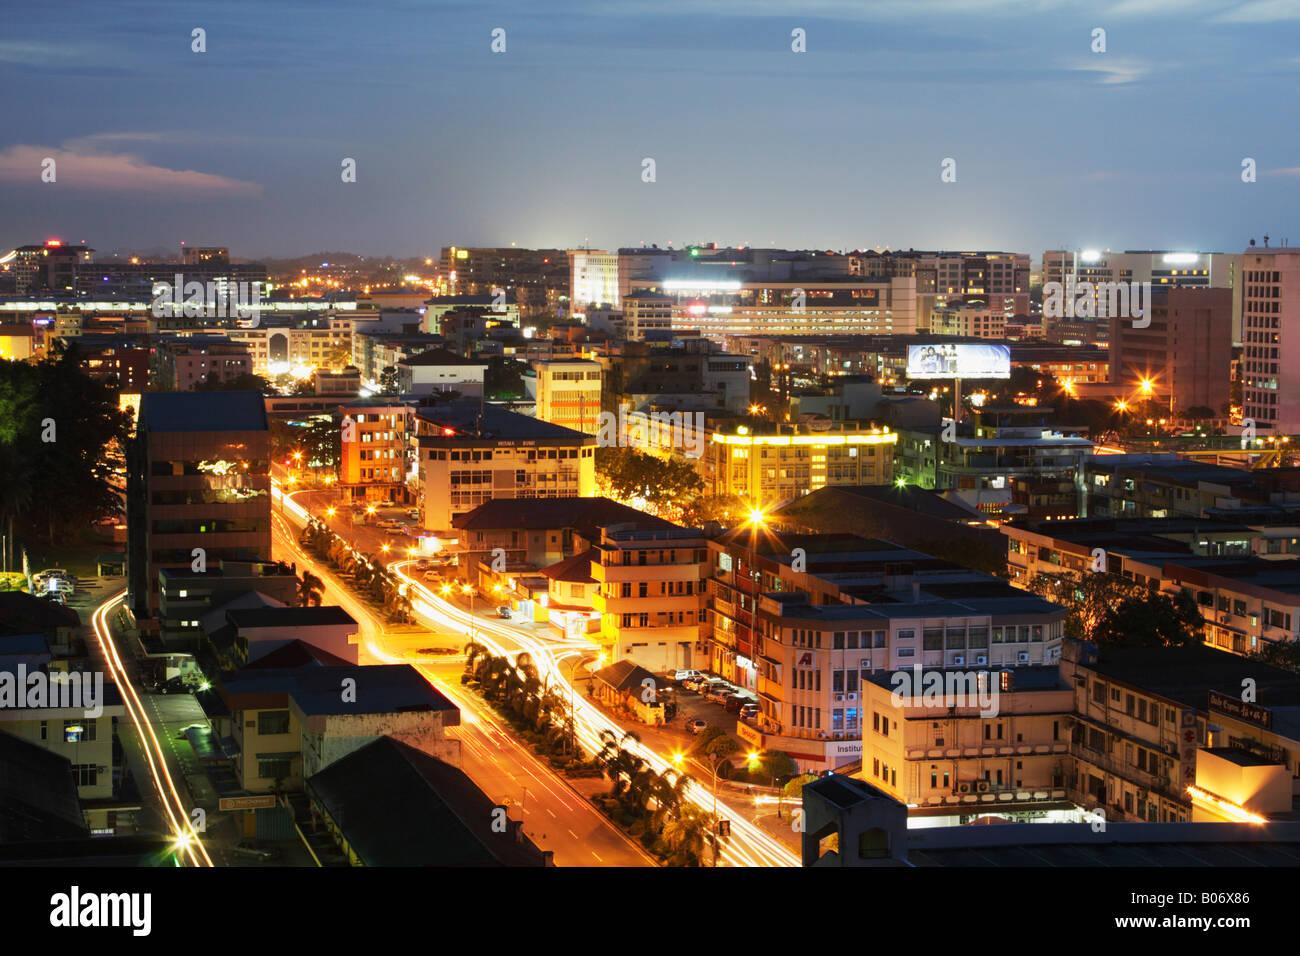 Night View Of Kota Kinabalu, Sabah, Malaysian Borneo - Stock Image